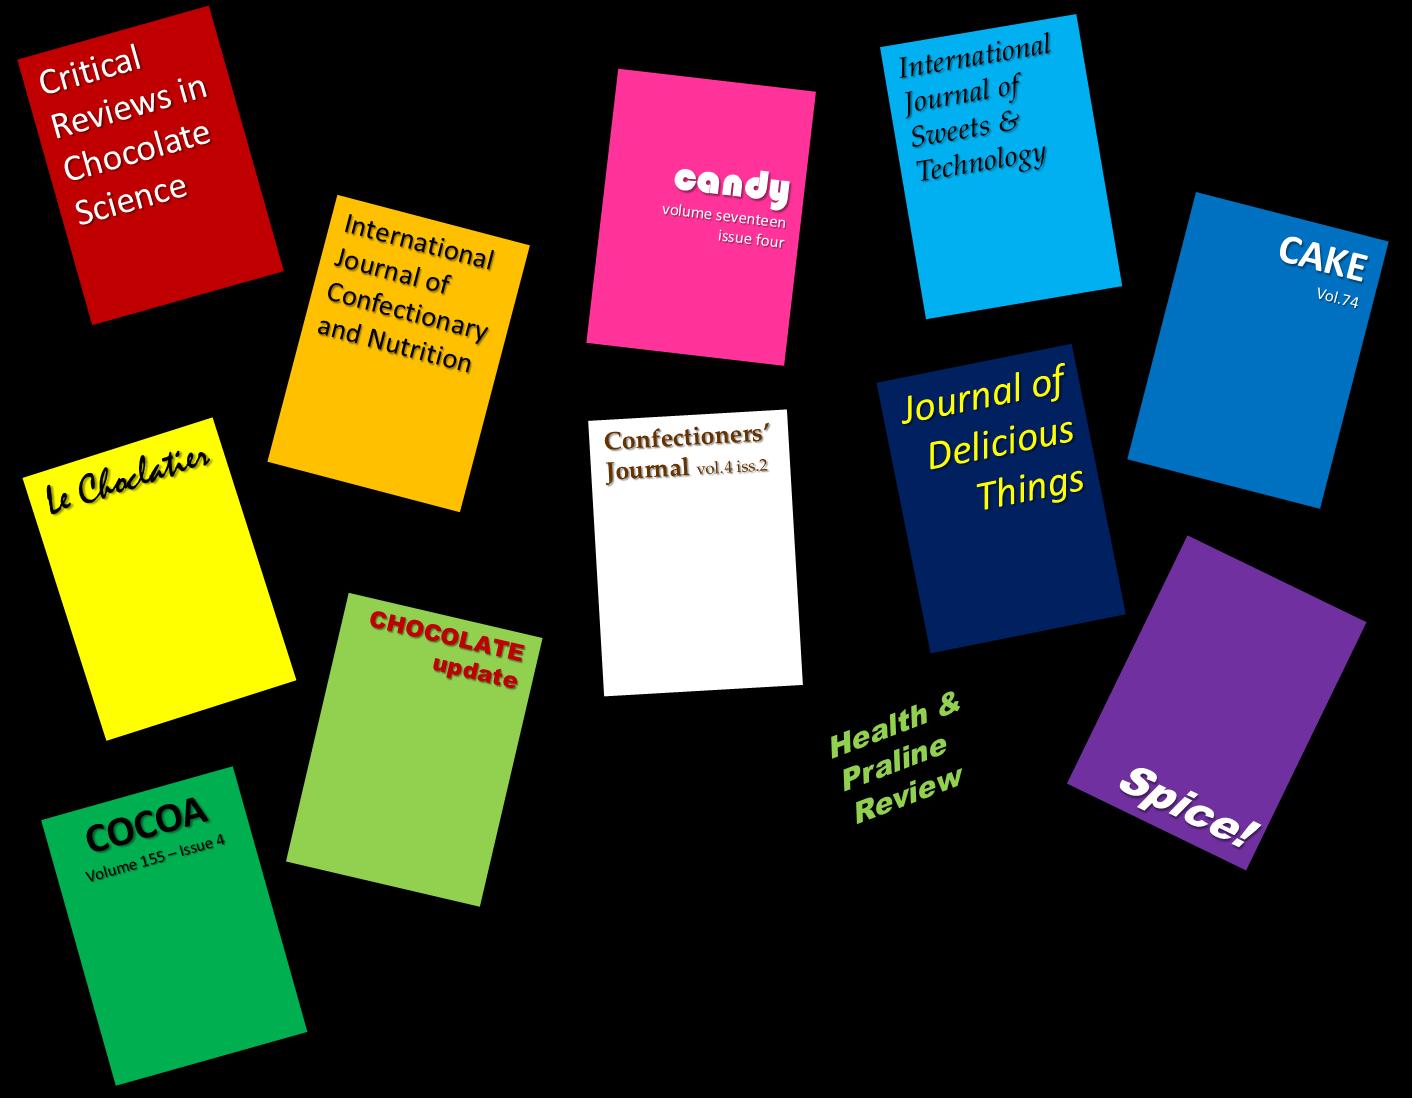 All 12 journals